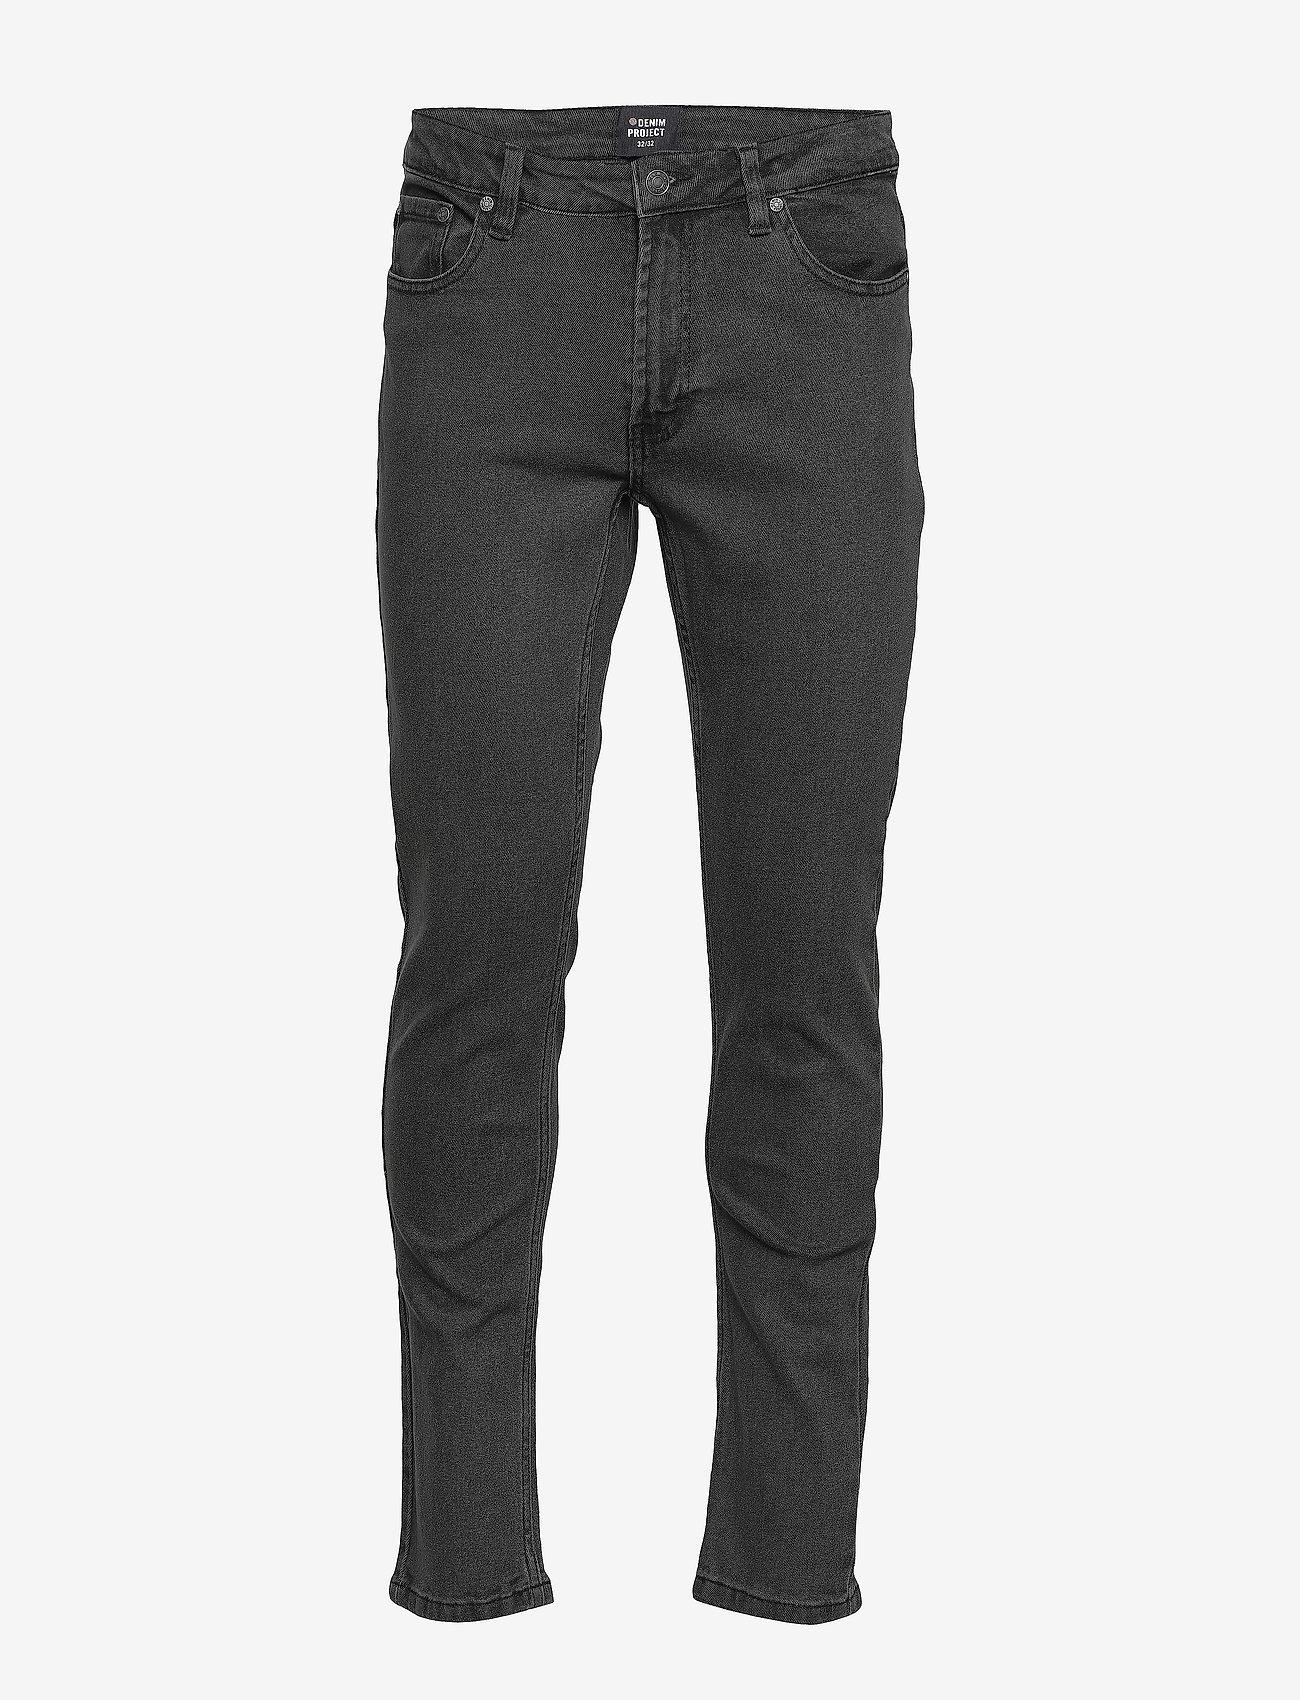 Denim project - Mr. Red - slim jeans - grey - 0